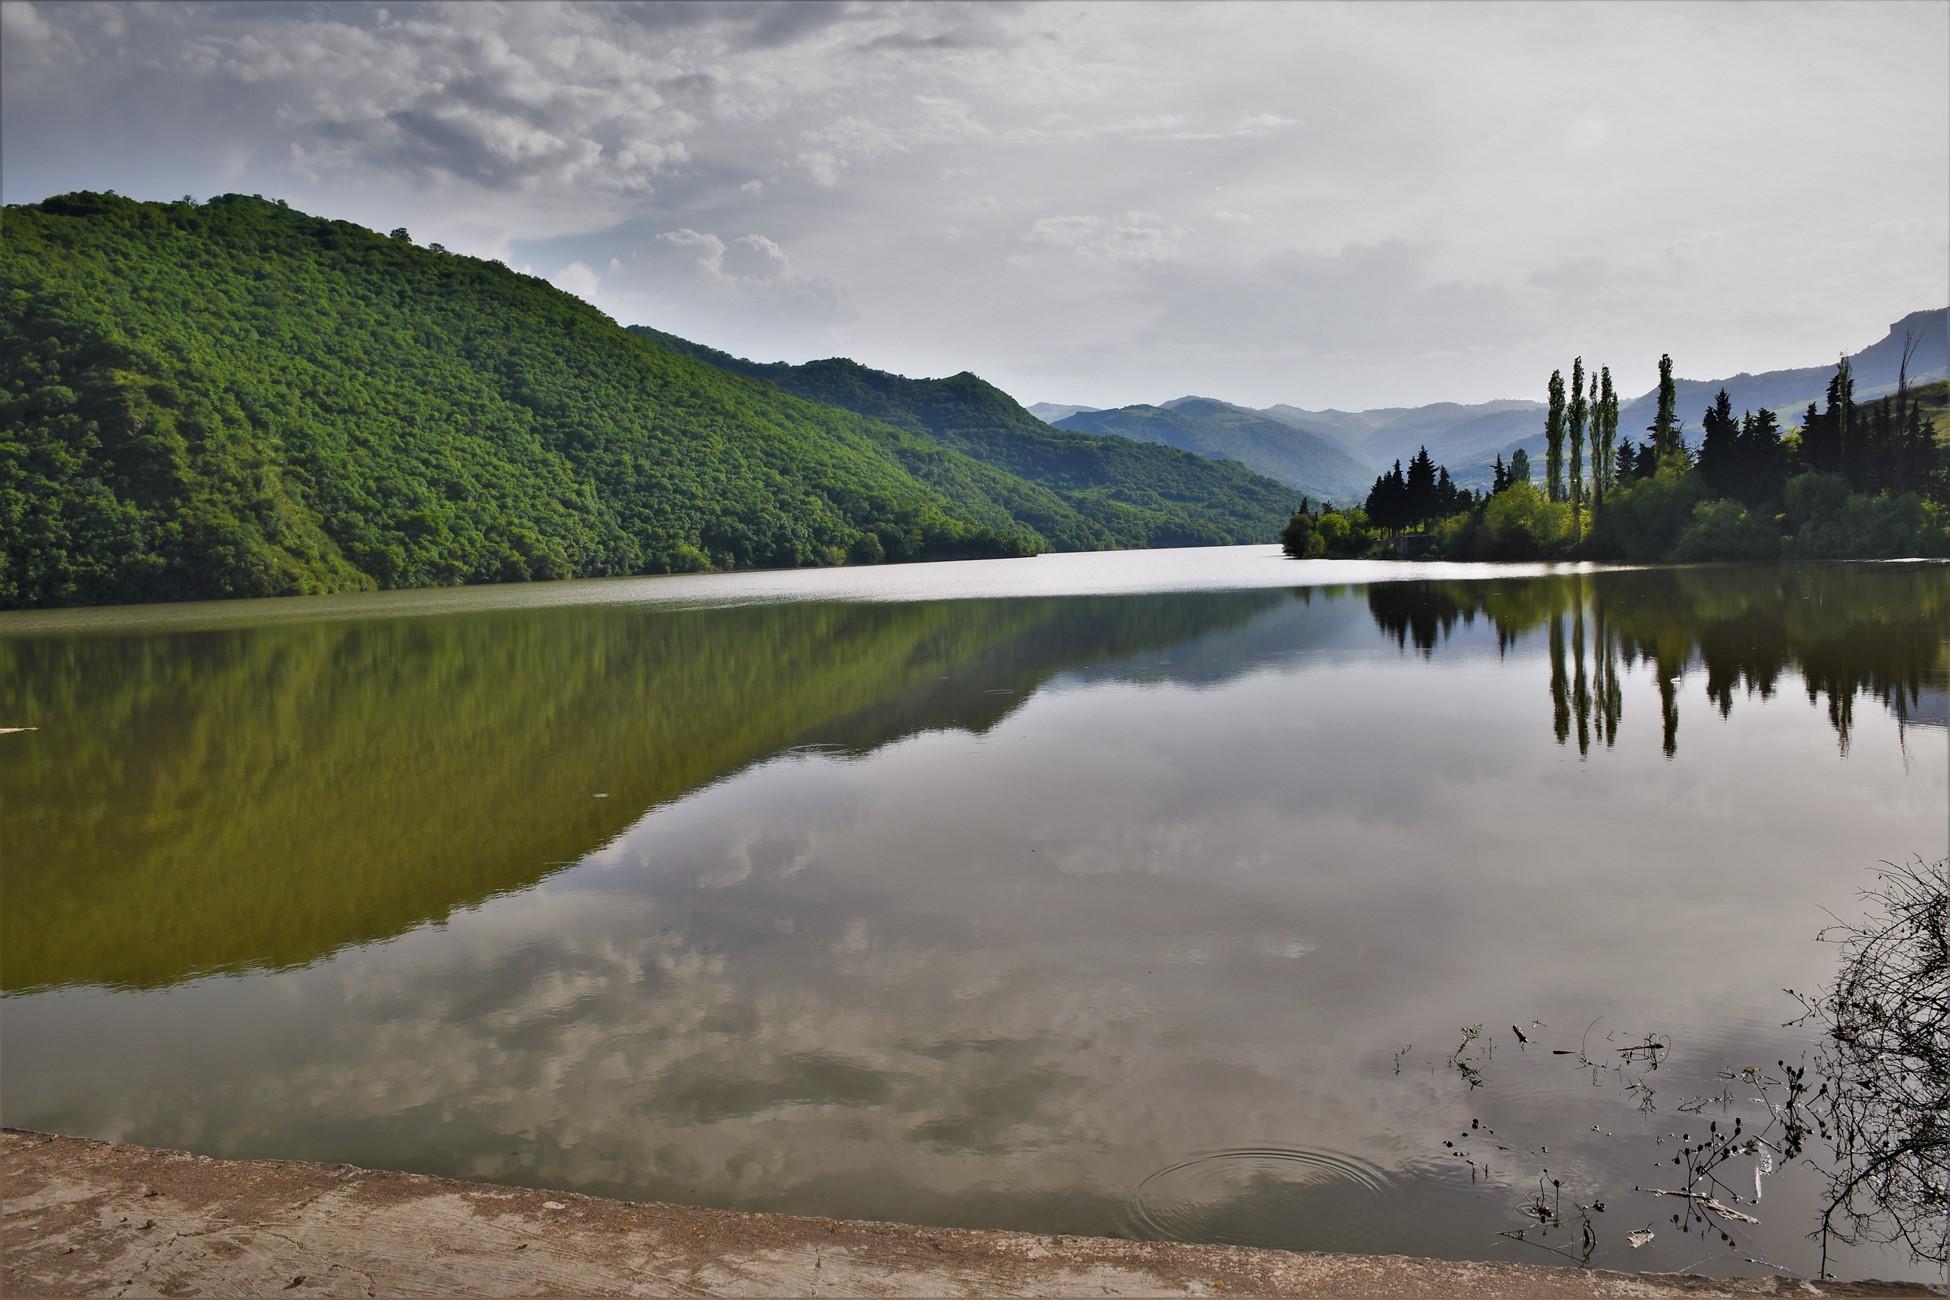 Landscape in Armenia.